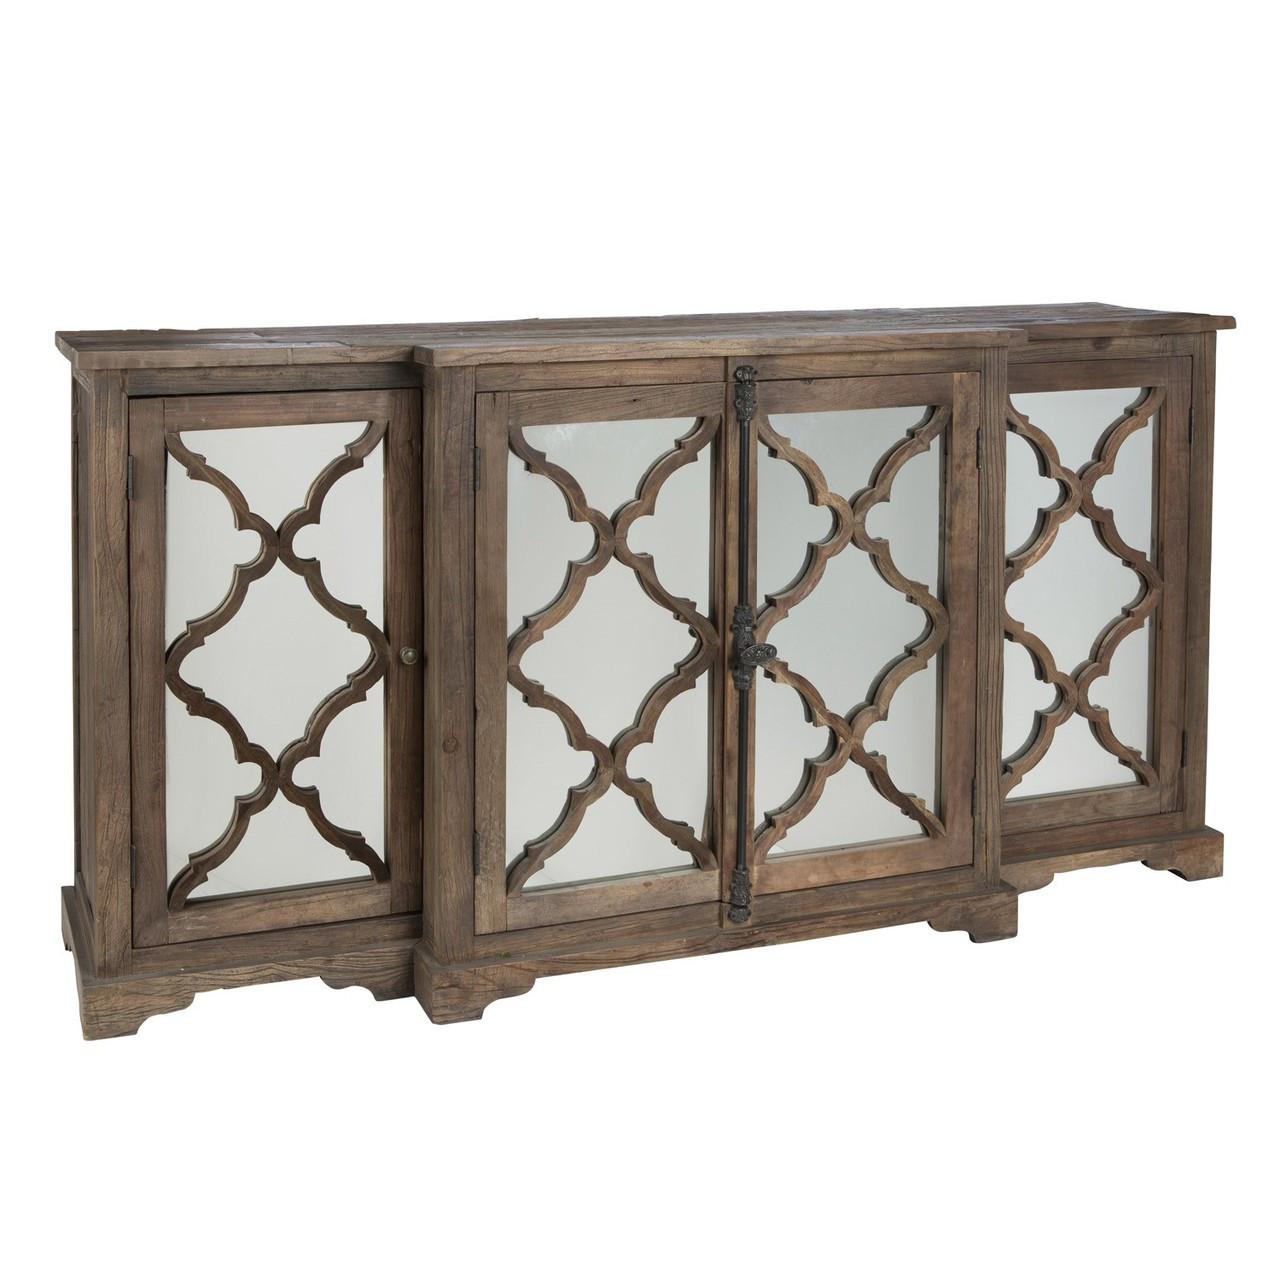 Aidan Gray Furniture Lowery Buffet Sideboard with 4 Glass Paneled Door  sc 1 st  Zin Home & Lowery Buffet Sideboard with 4 Glass Paneled Door | Zin Home